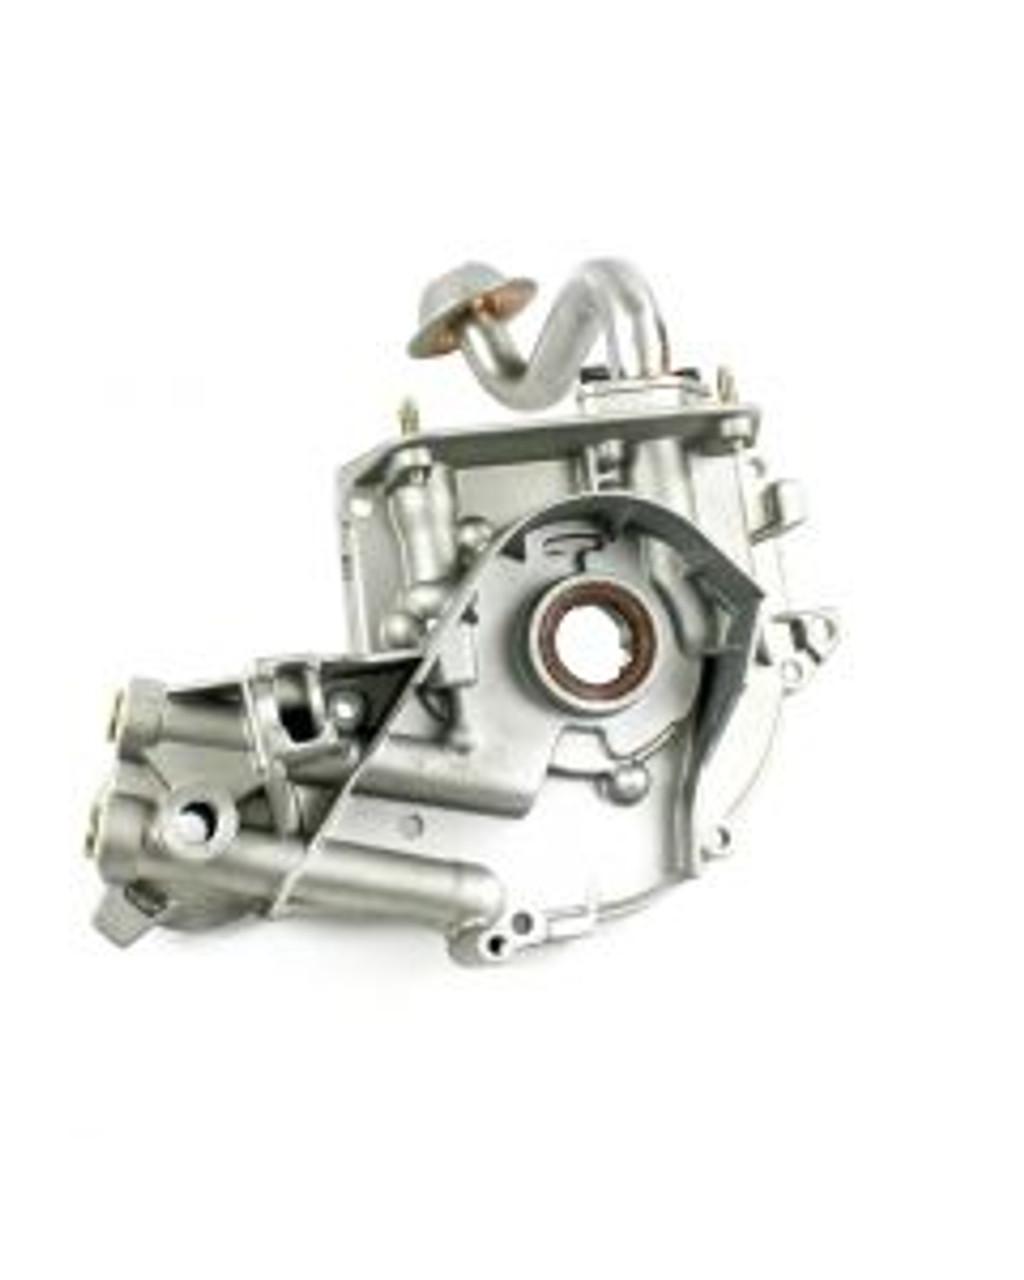 Oil Pump 1.4L 2014 Fiat 500 - OP4254.7